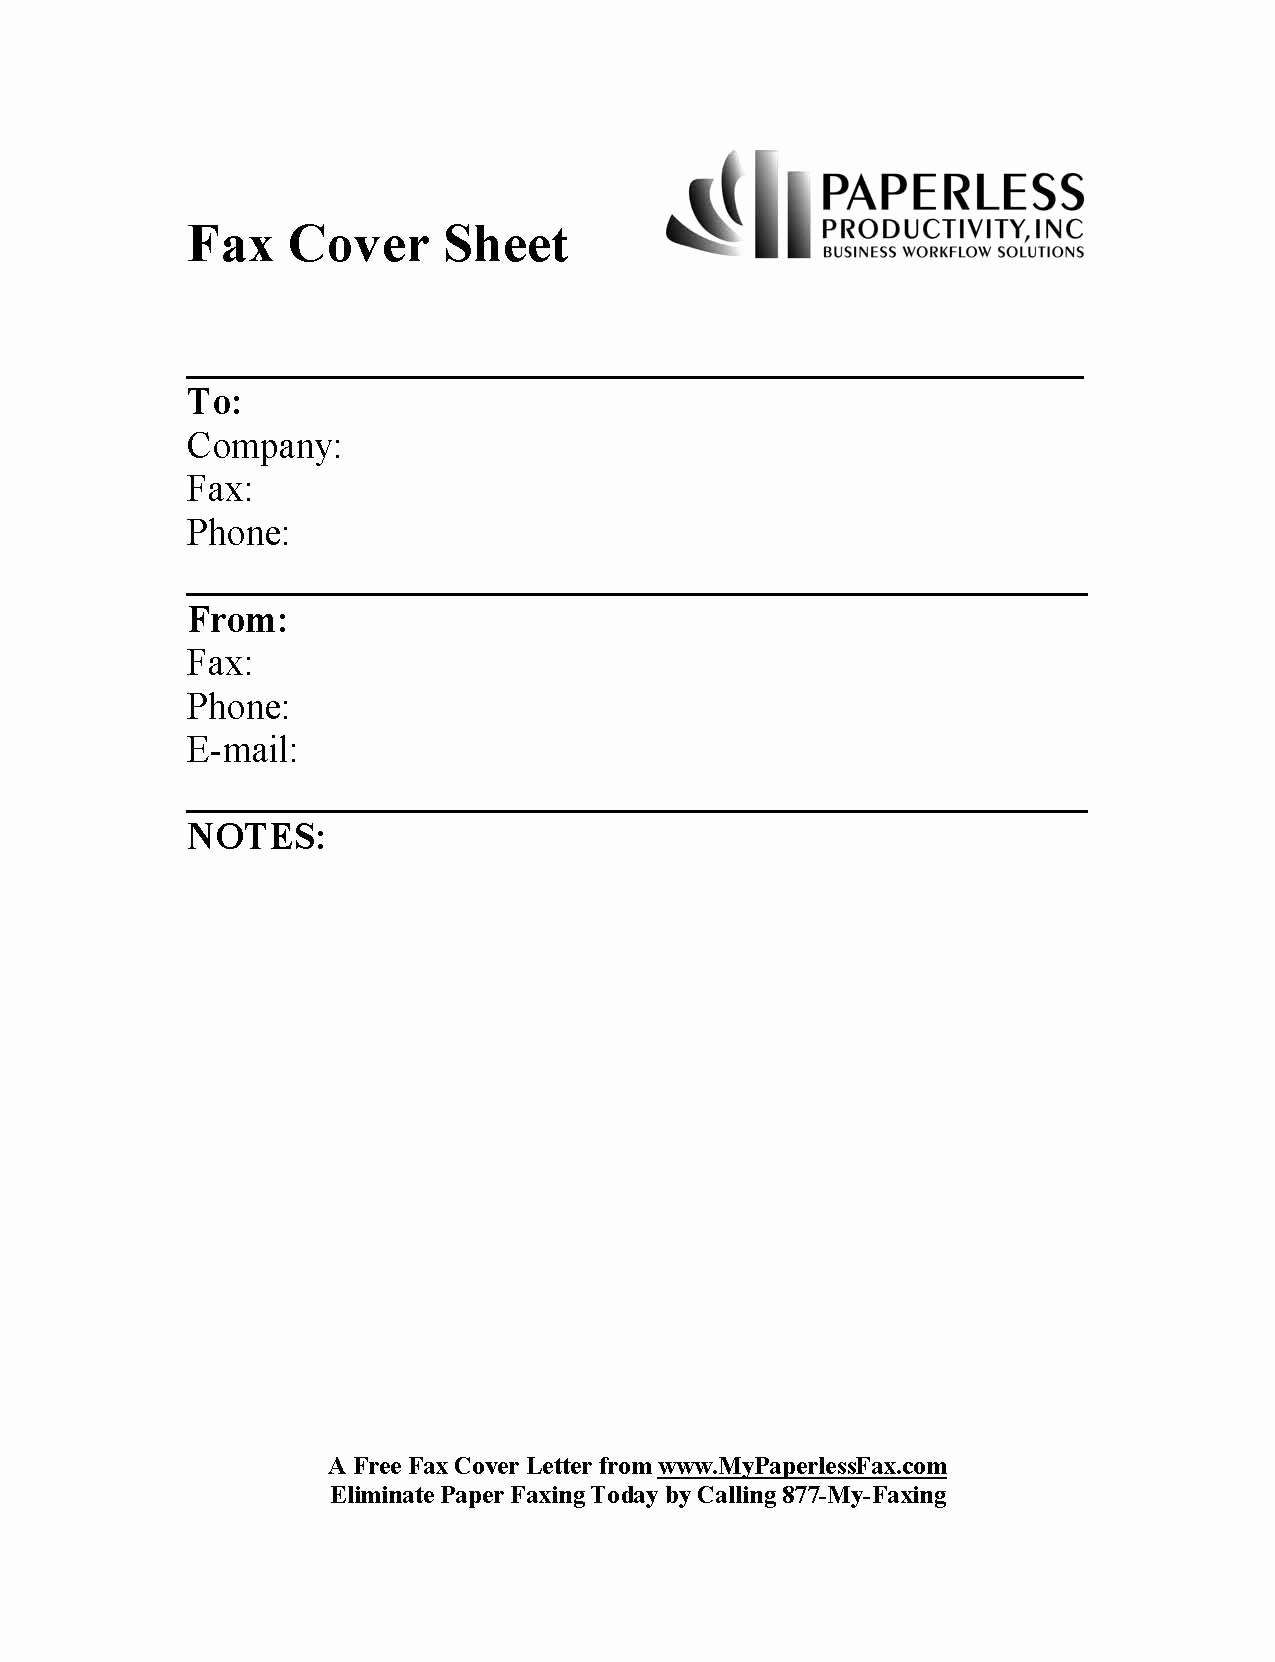 Cover Sheet for A Fax Luxury Microsoft Fice Fax Template Portablegasgrillweber